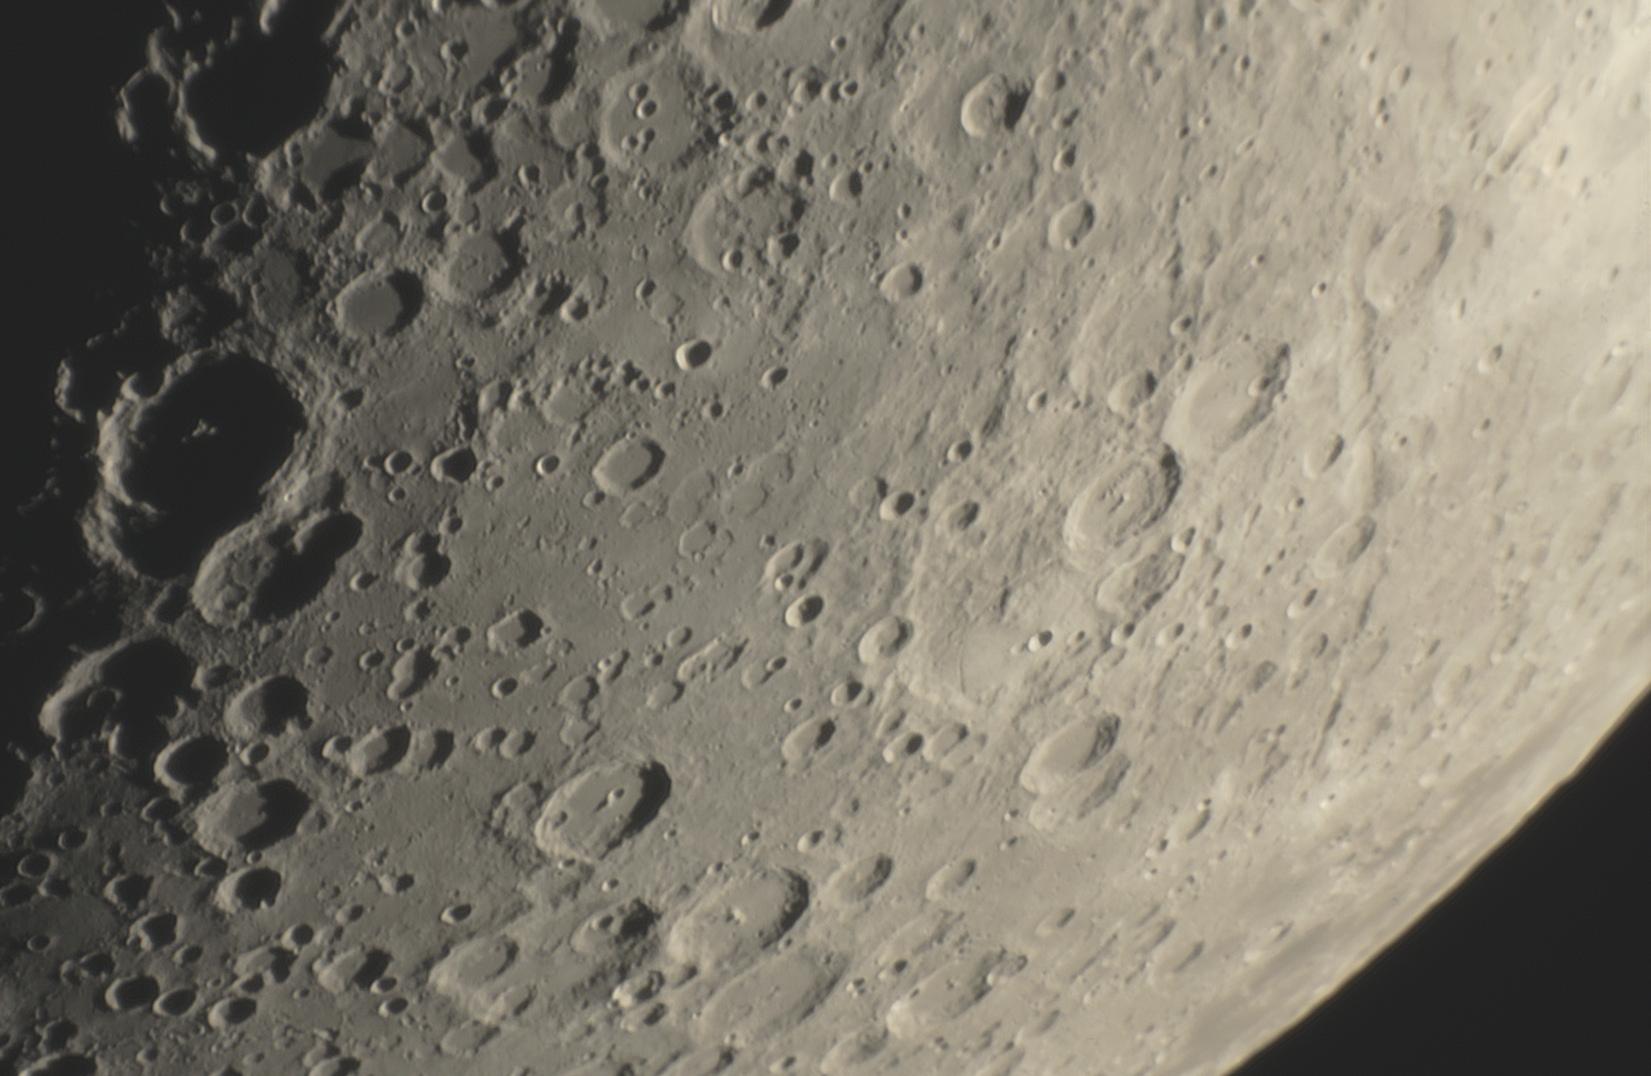 lune18.jpg.838bf870c6d52a975d87e9326414e129.jpg